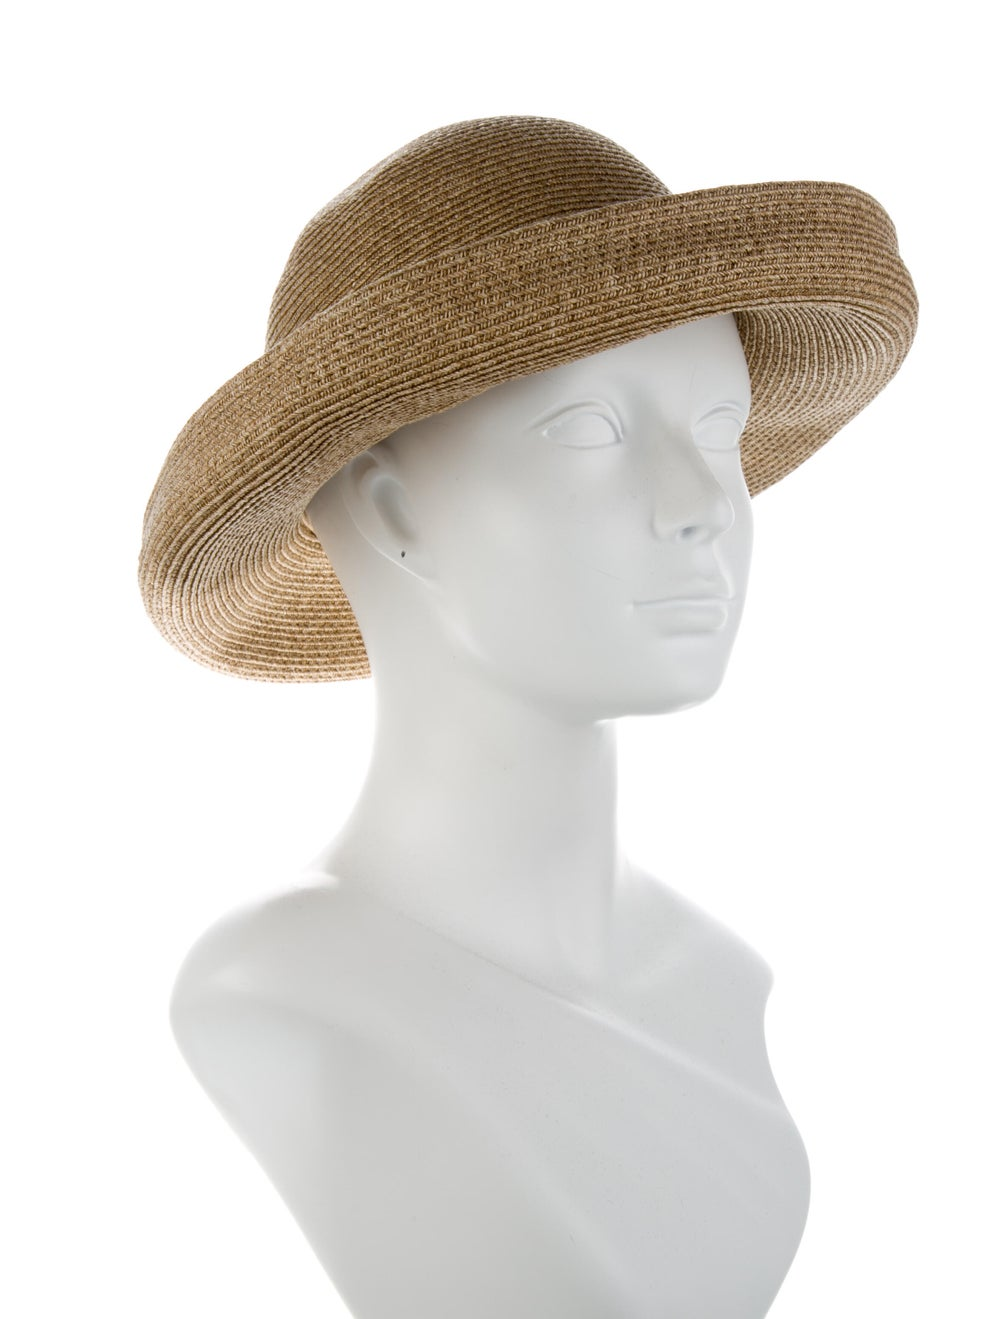 Eric Javits Straw Wide-Brim Hat - image 3